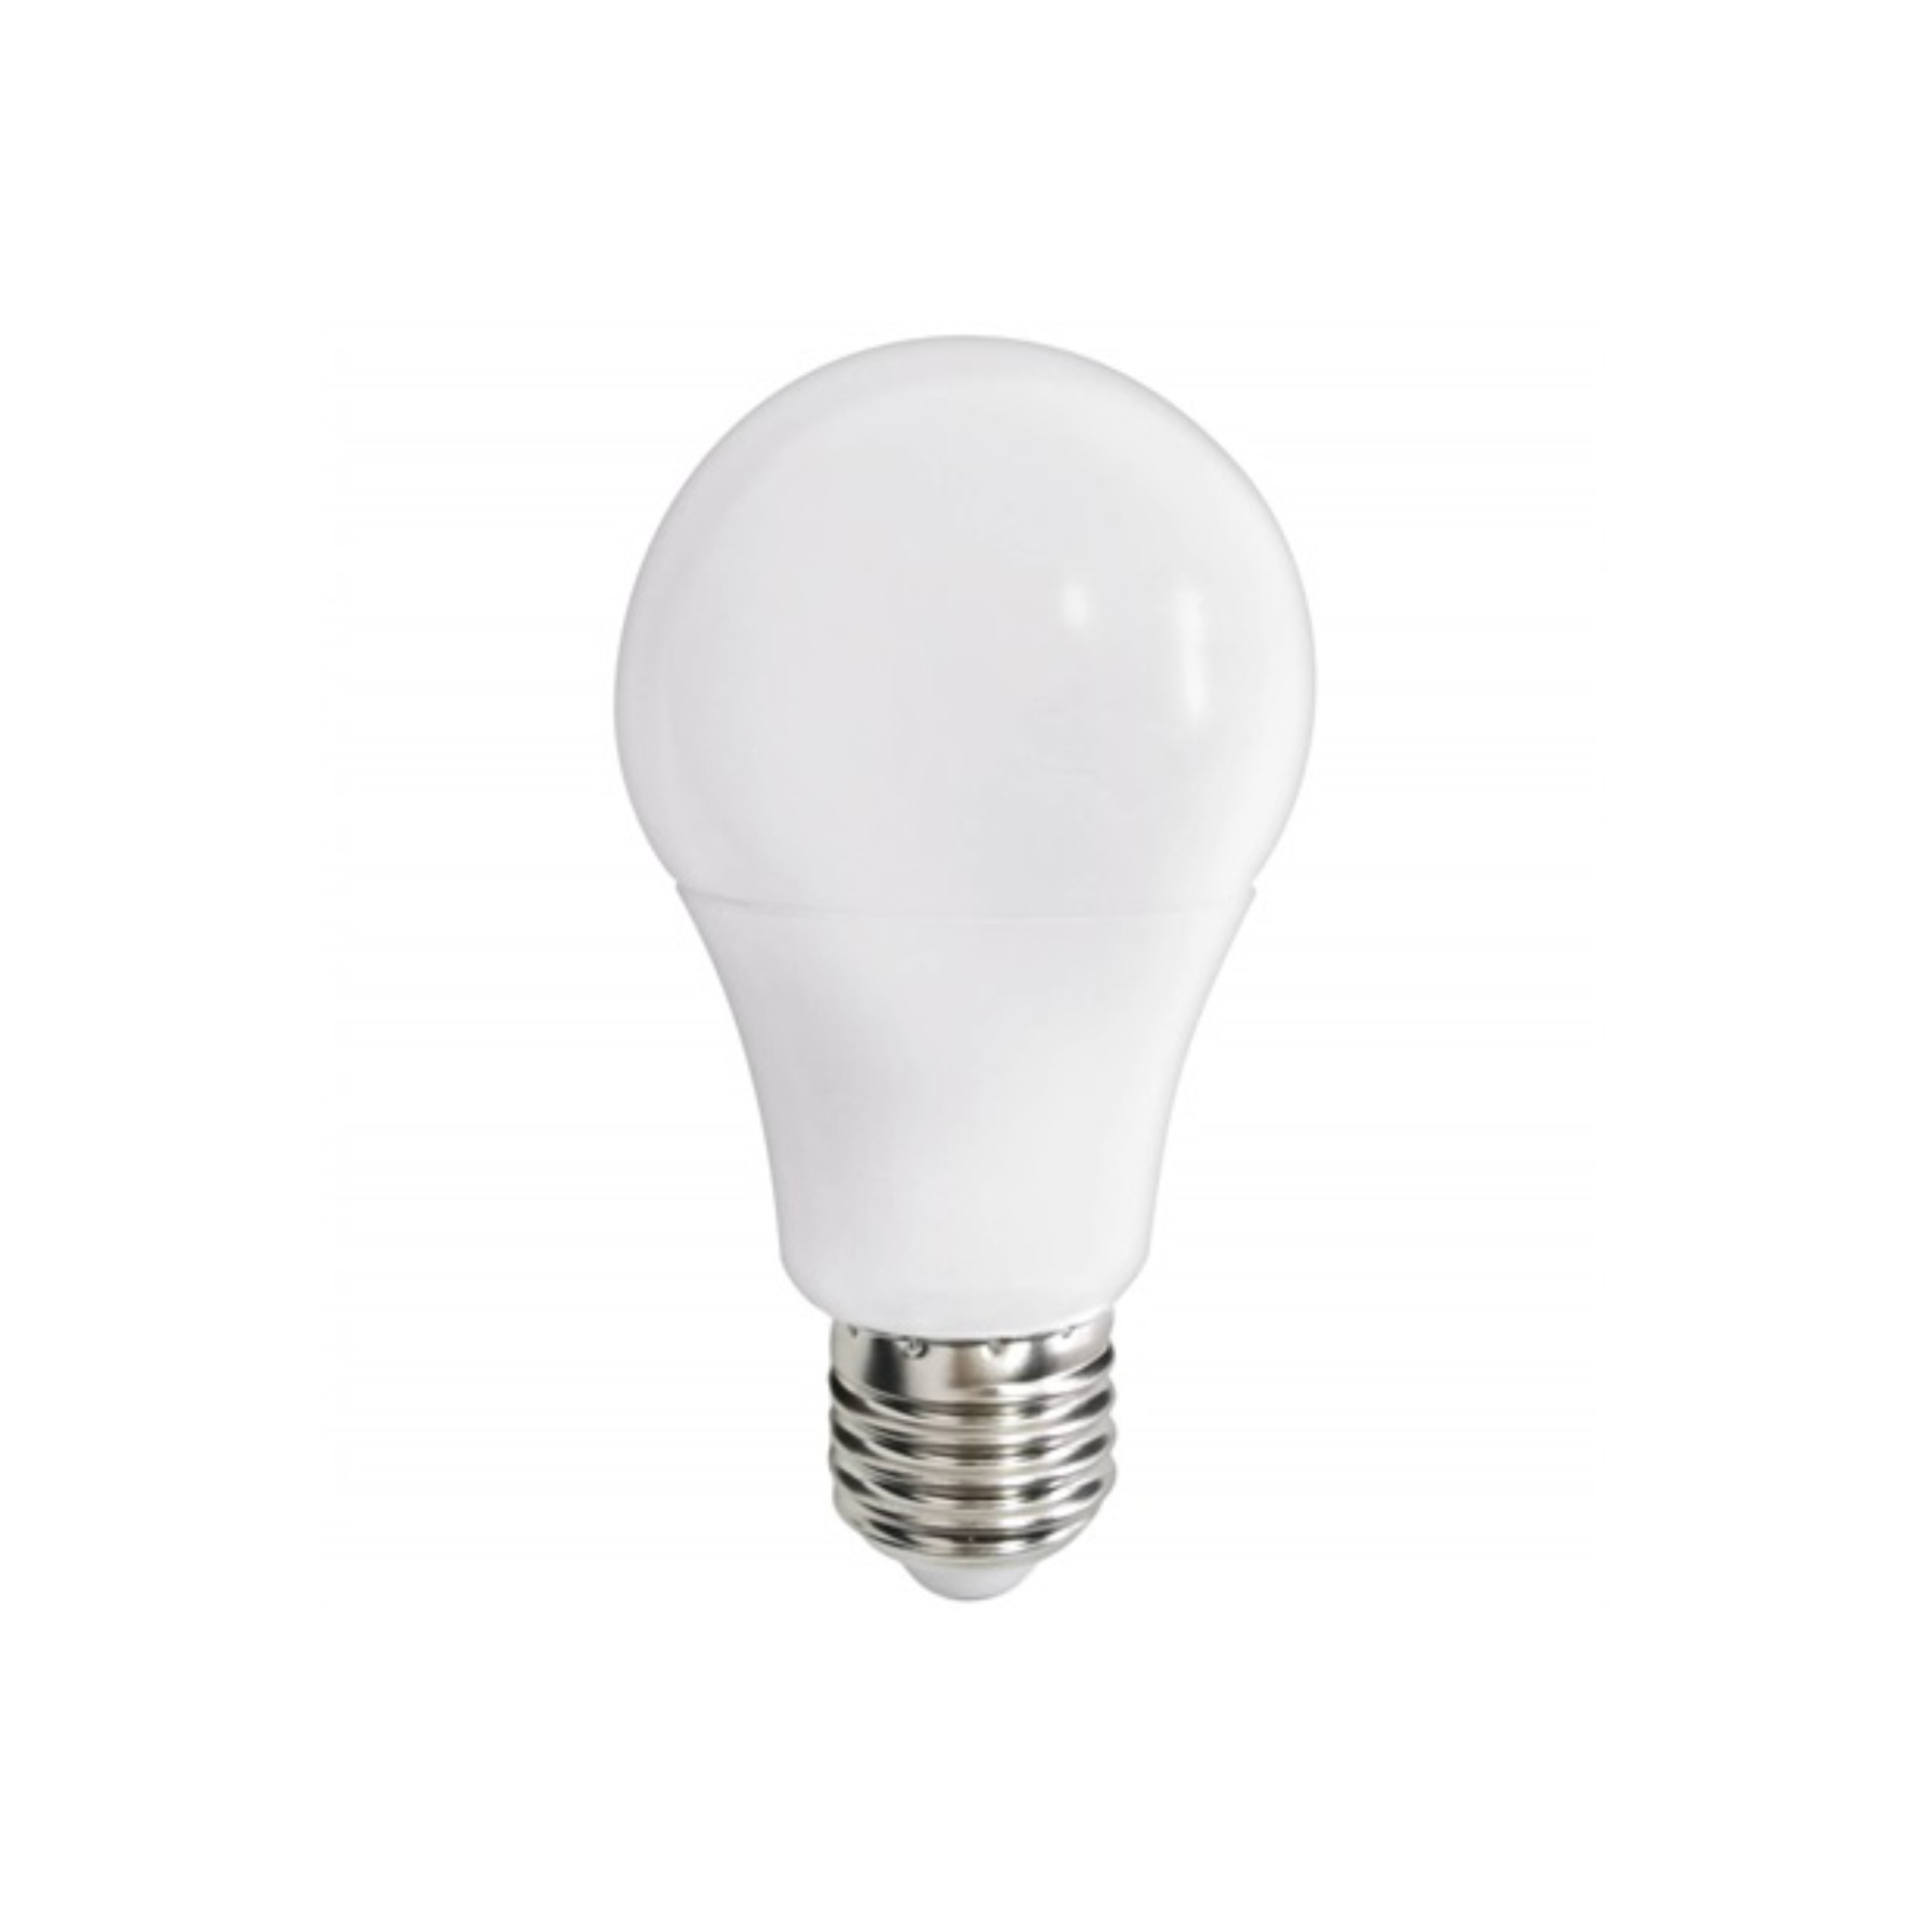 Lâmpada Led Tubular 9w 60cm T8 Branco Frio